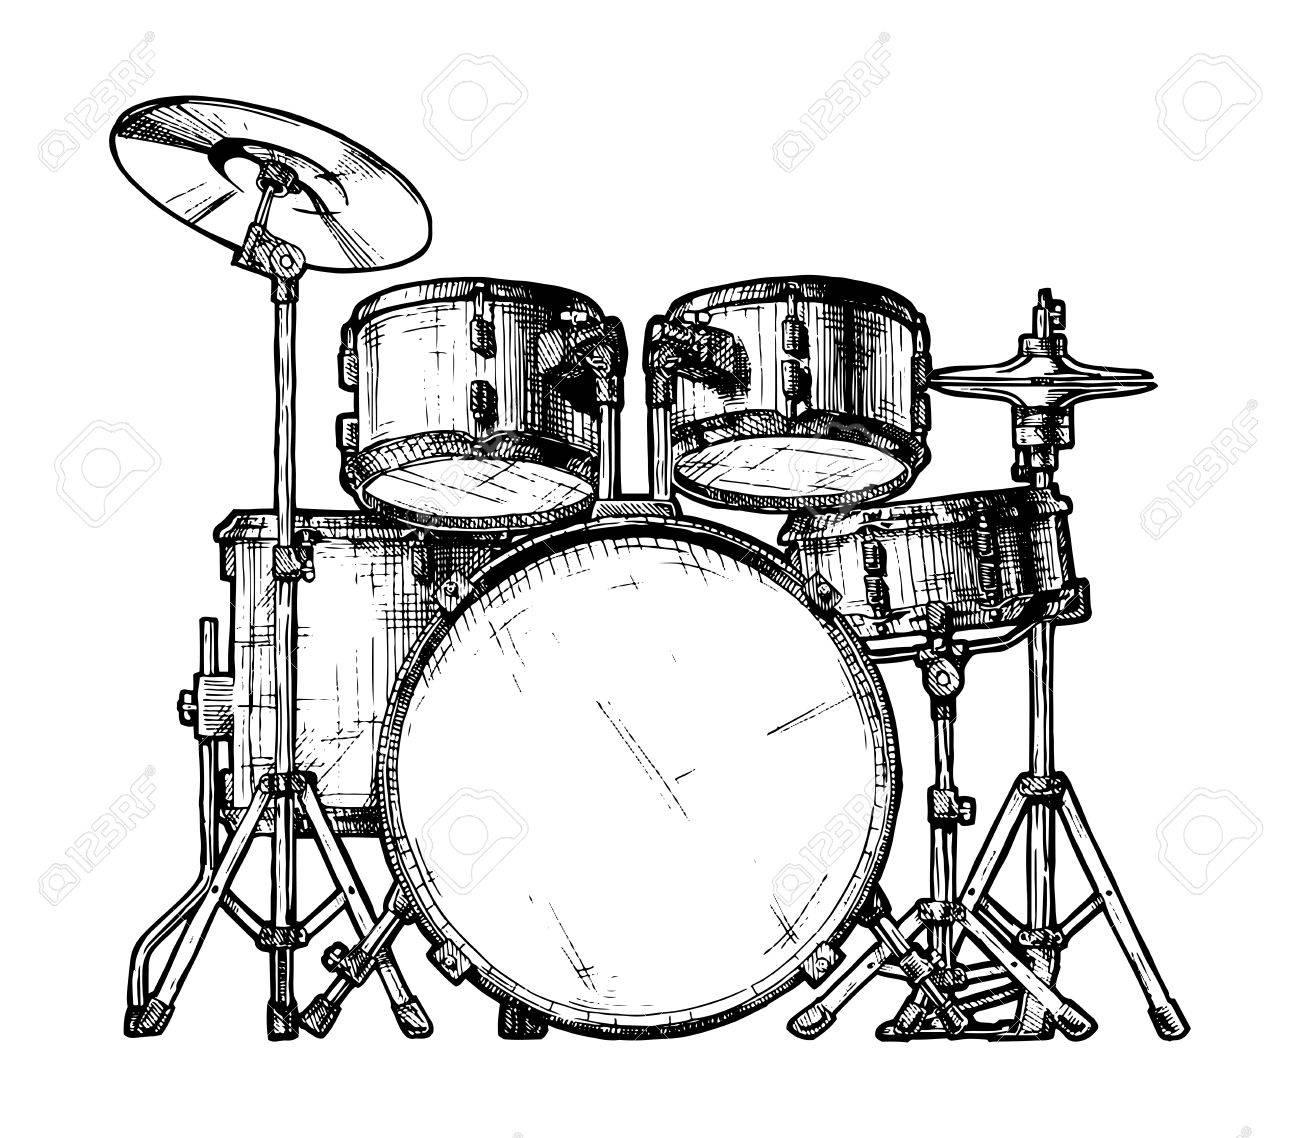 Bass Drum Drawing At Getdrawings